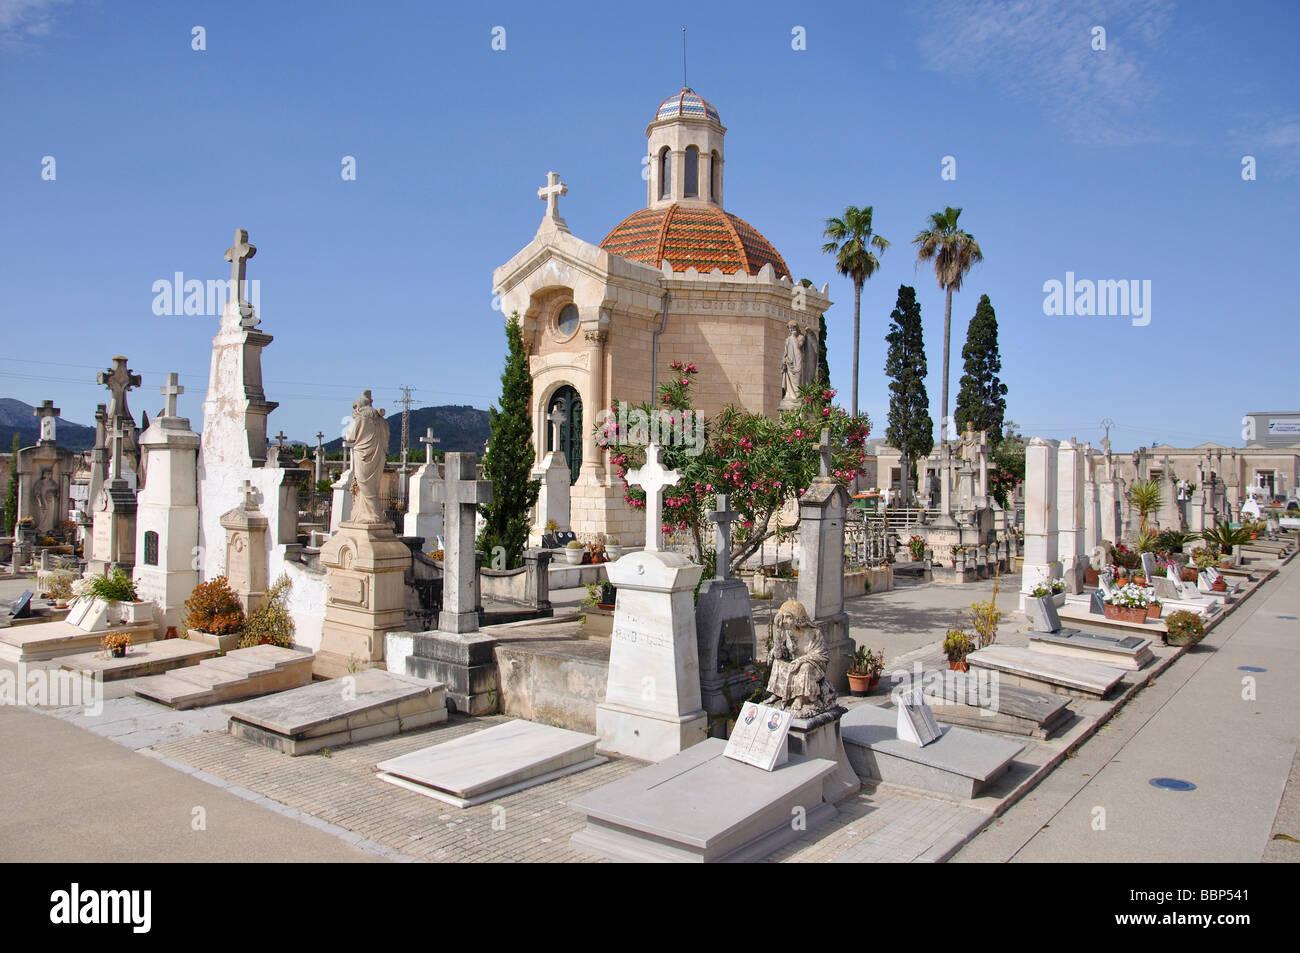 Sa Pobla Cemetery, Sa Pobla, Sa Pobla Municipality, Mallorca, Balearic Islands, Spain - Stock Image